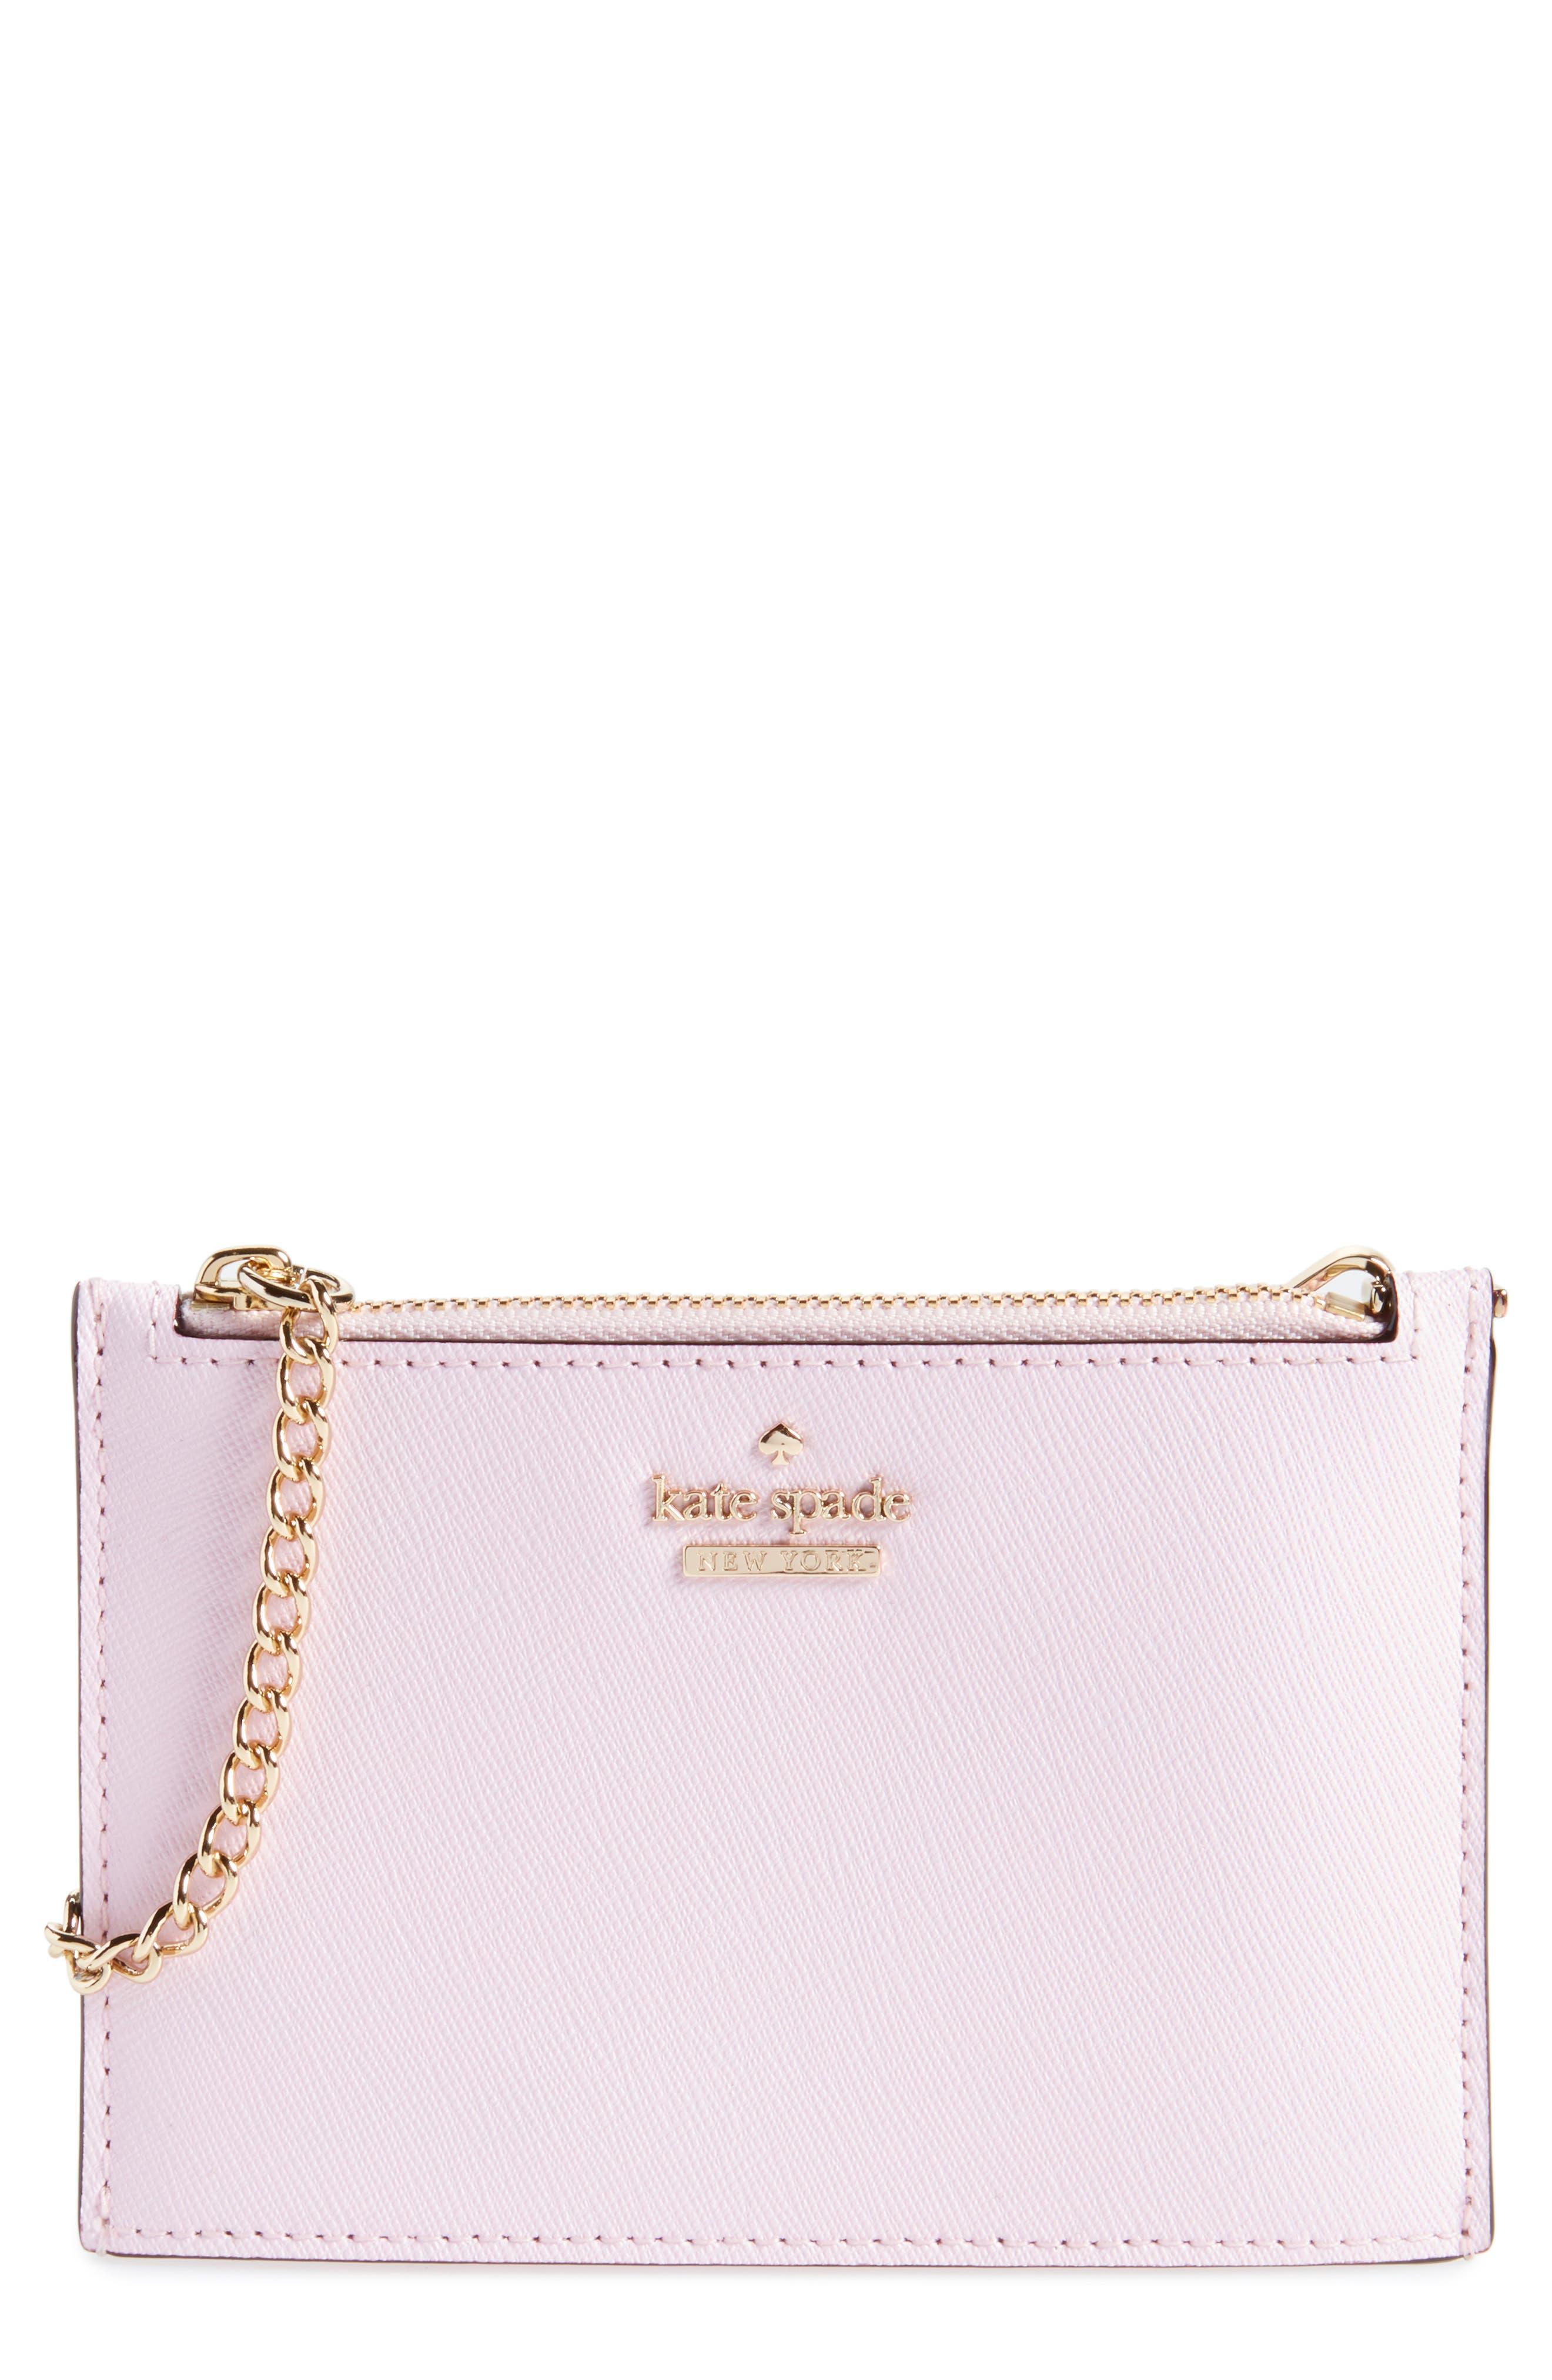 cameron street caroline leather zip pouch,                             Main thumbnail 1, color,                             Pink Lemonade